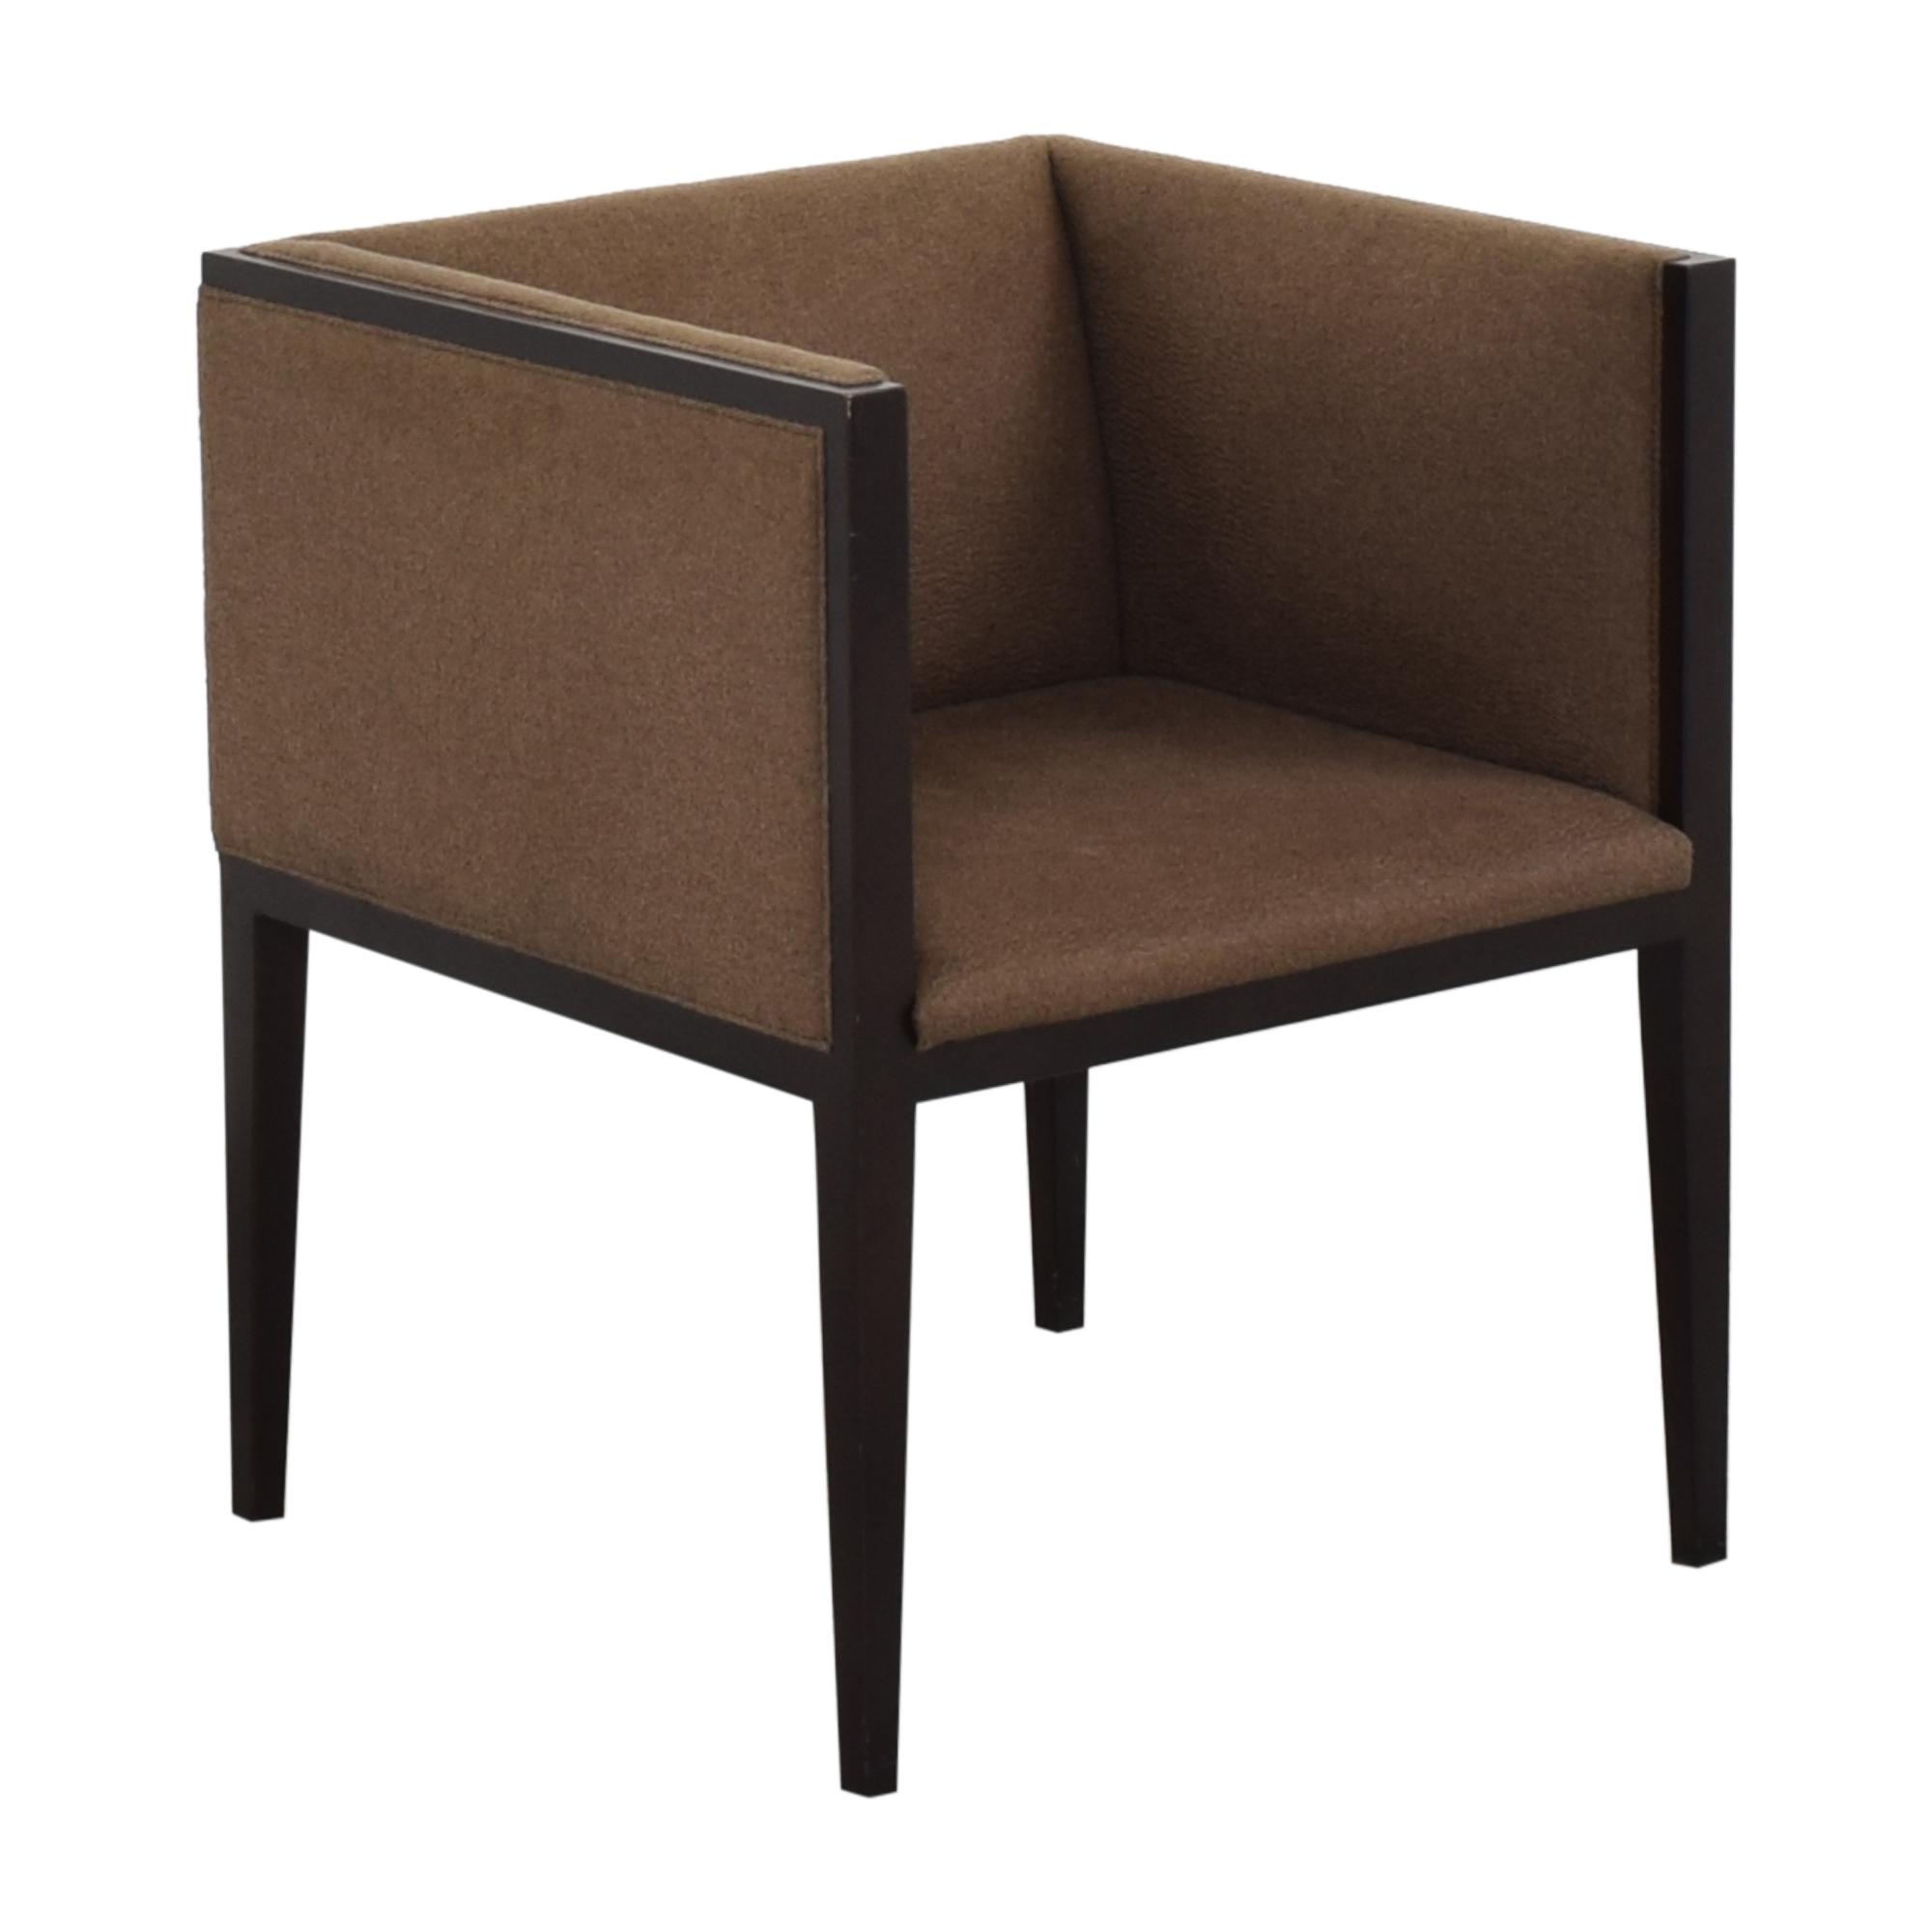 shop Hudson Furniture & Bedding Hudson Furniture & Bedding Tuxedo Accent Chair online